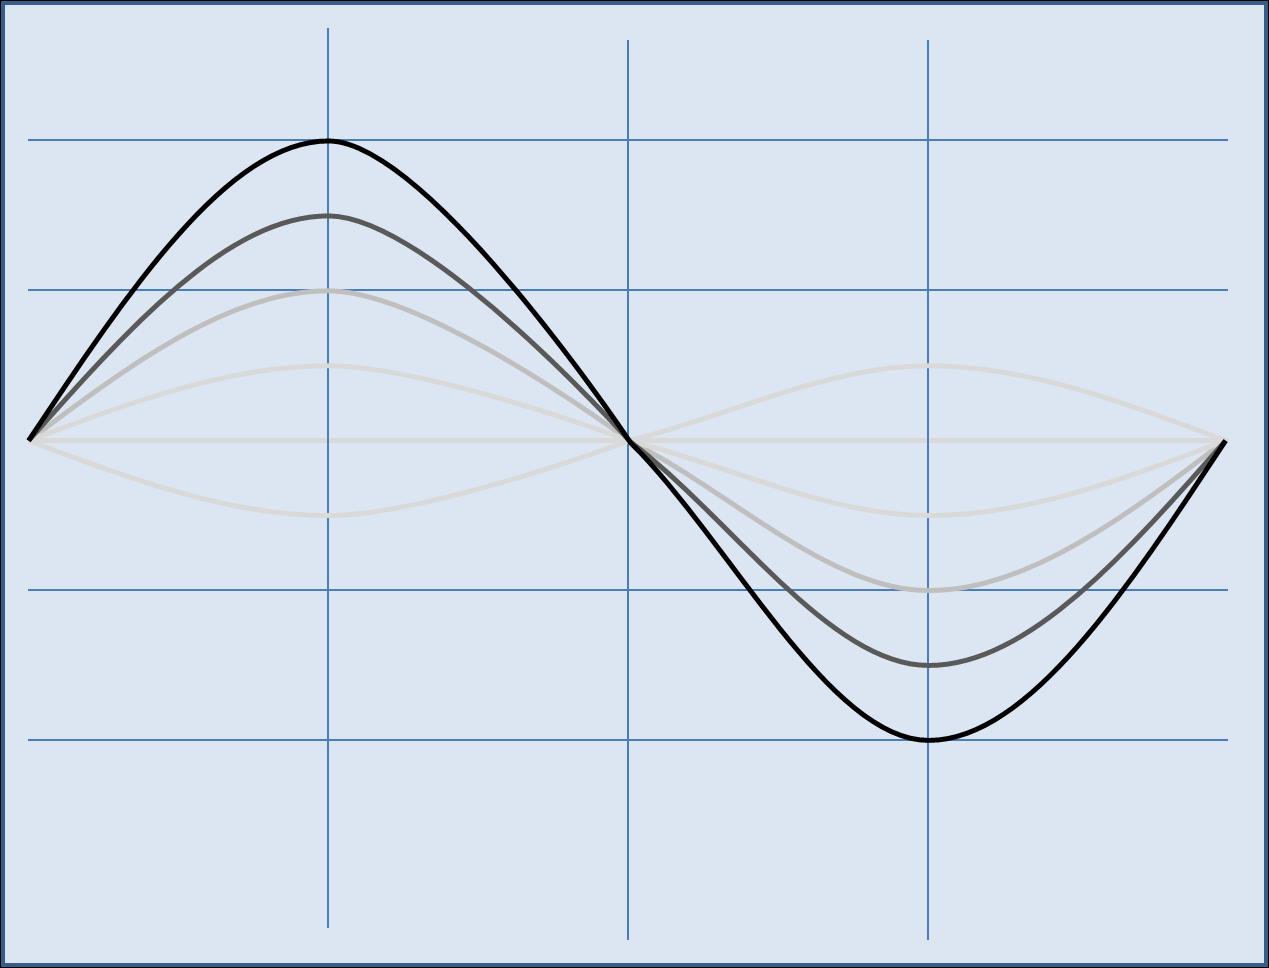 medium resolution of first harmonic vibration of piano wire